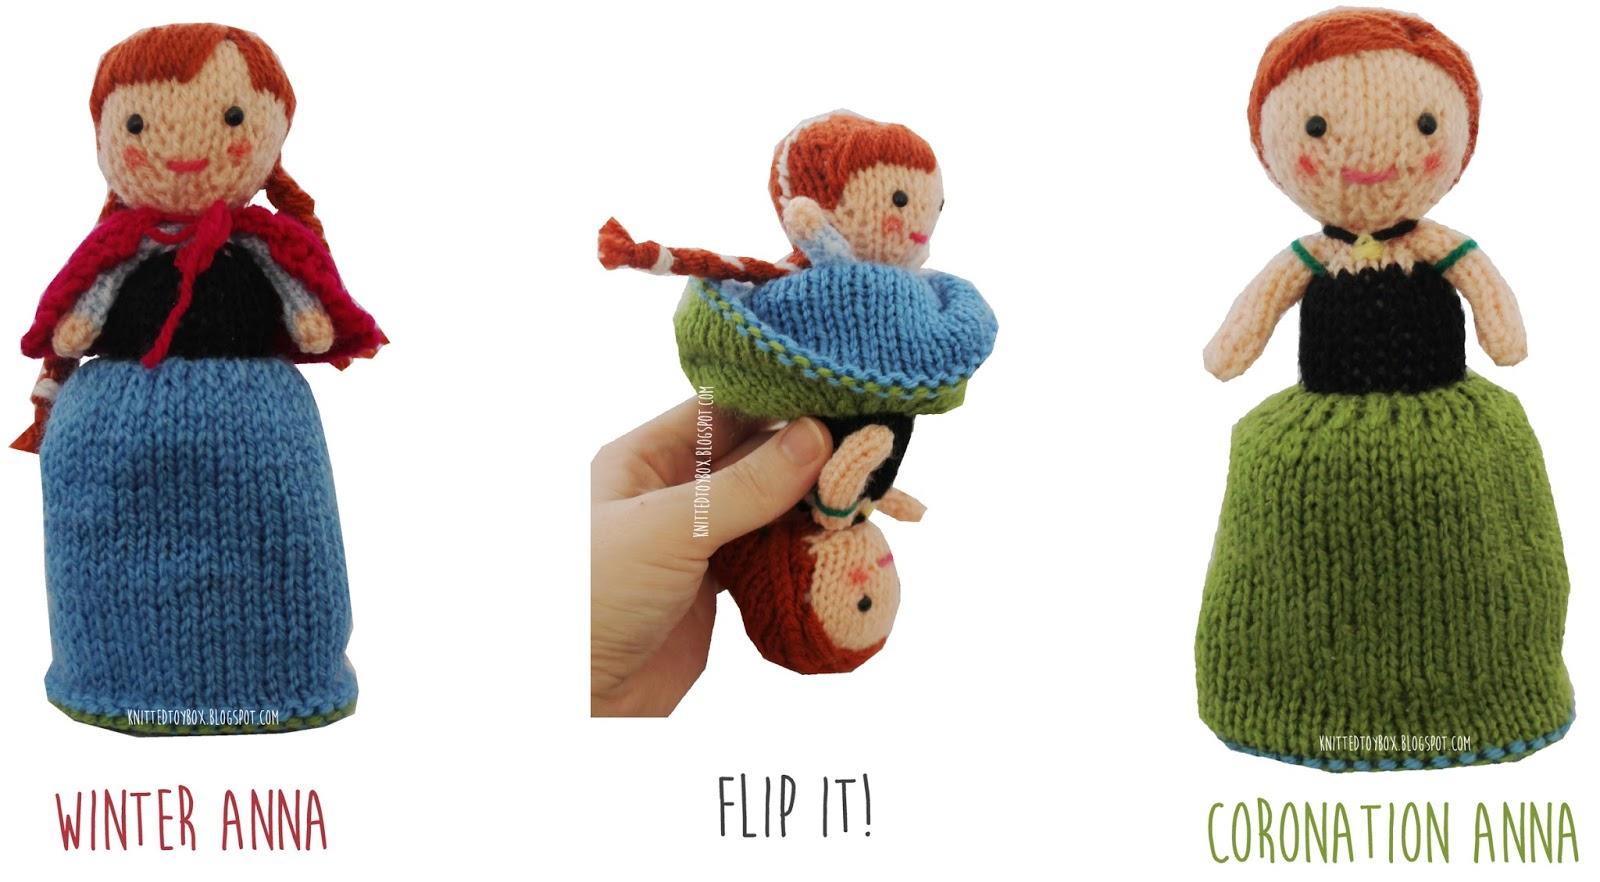 Cute Amigurumi Knitting Patterns : Elsa frozen amigurumi free pattern princess pattern anna frozen